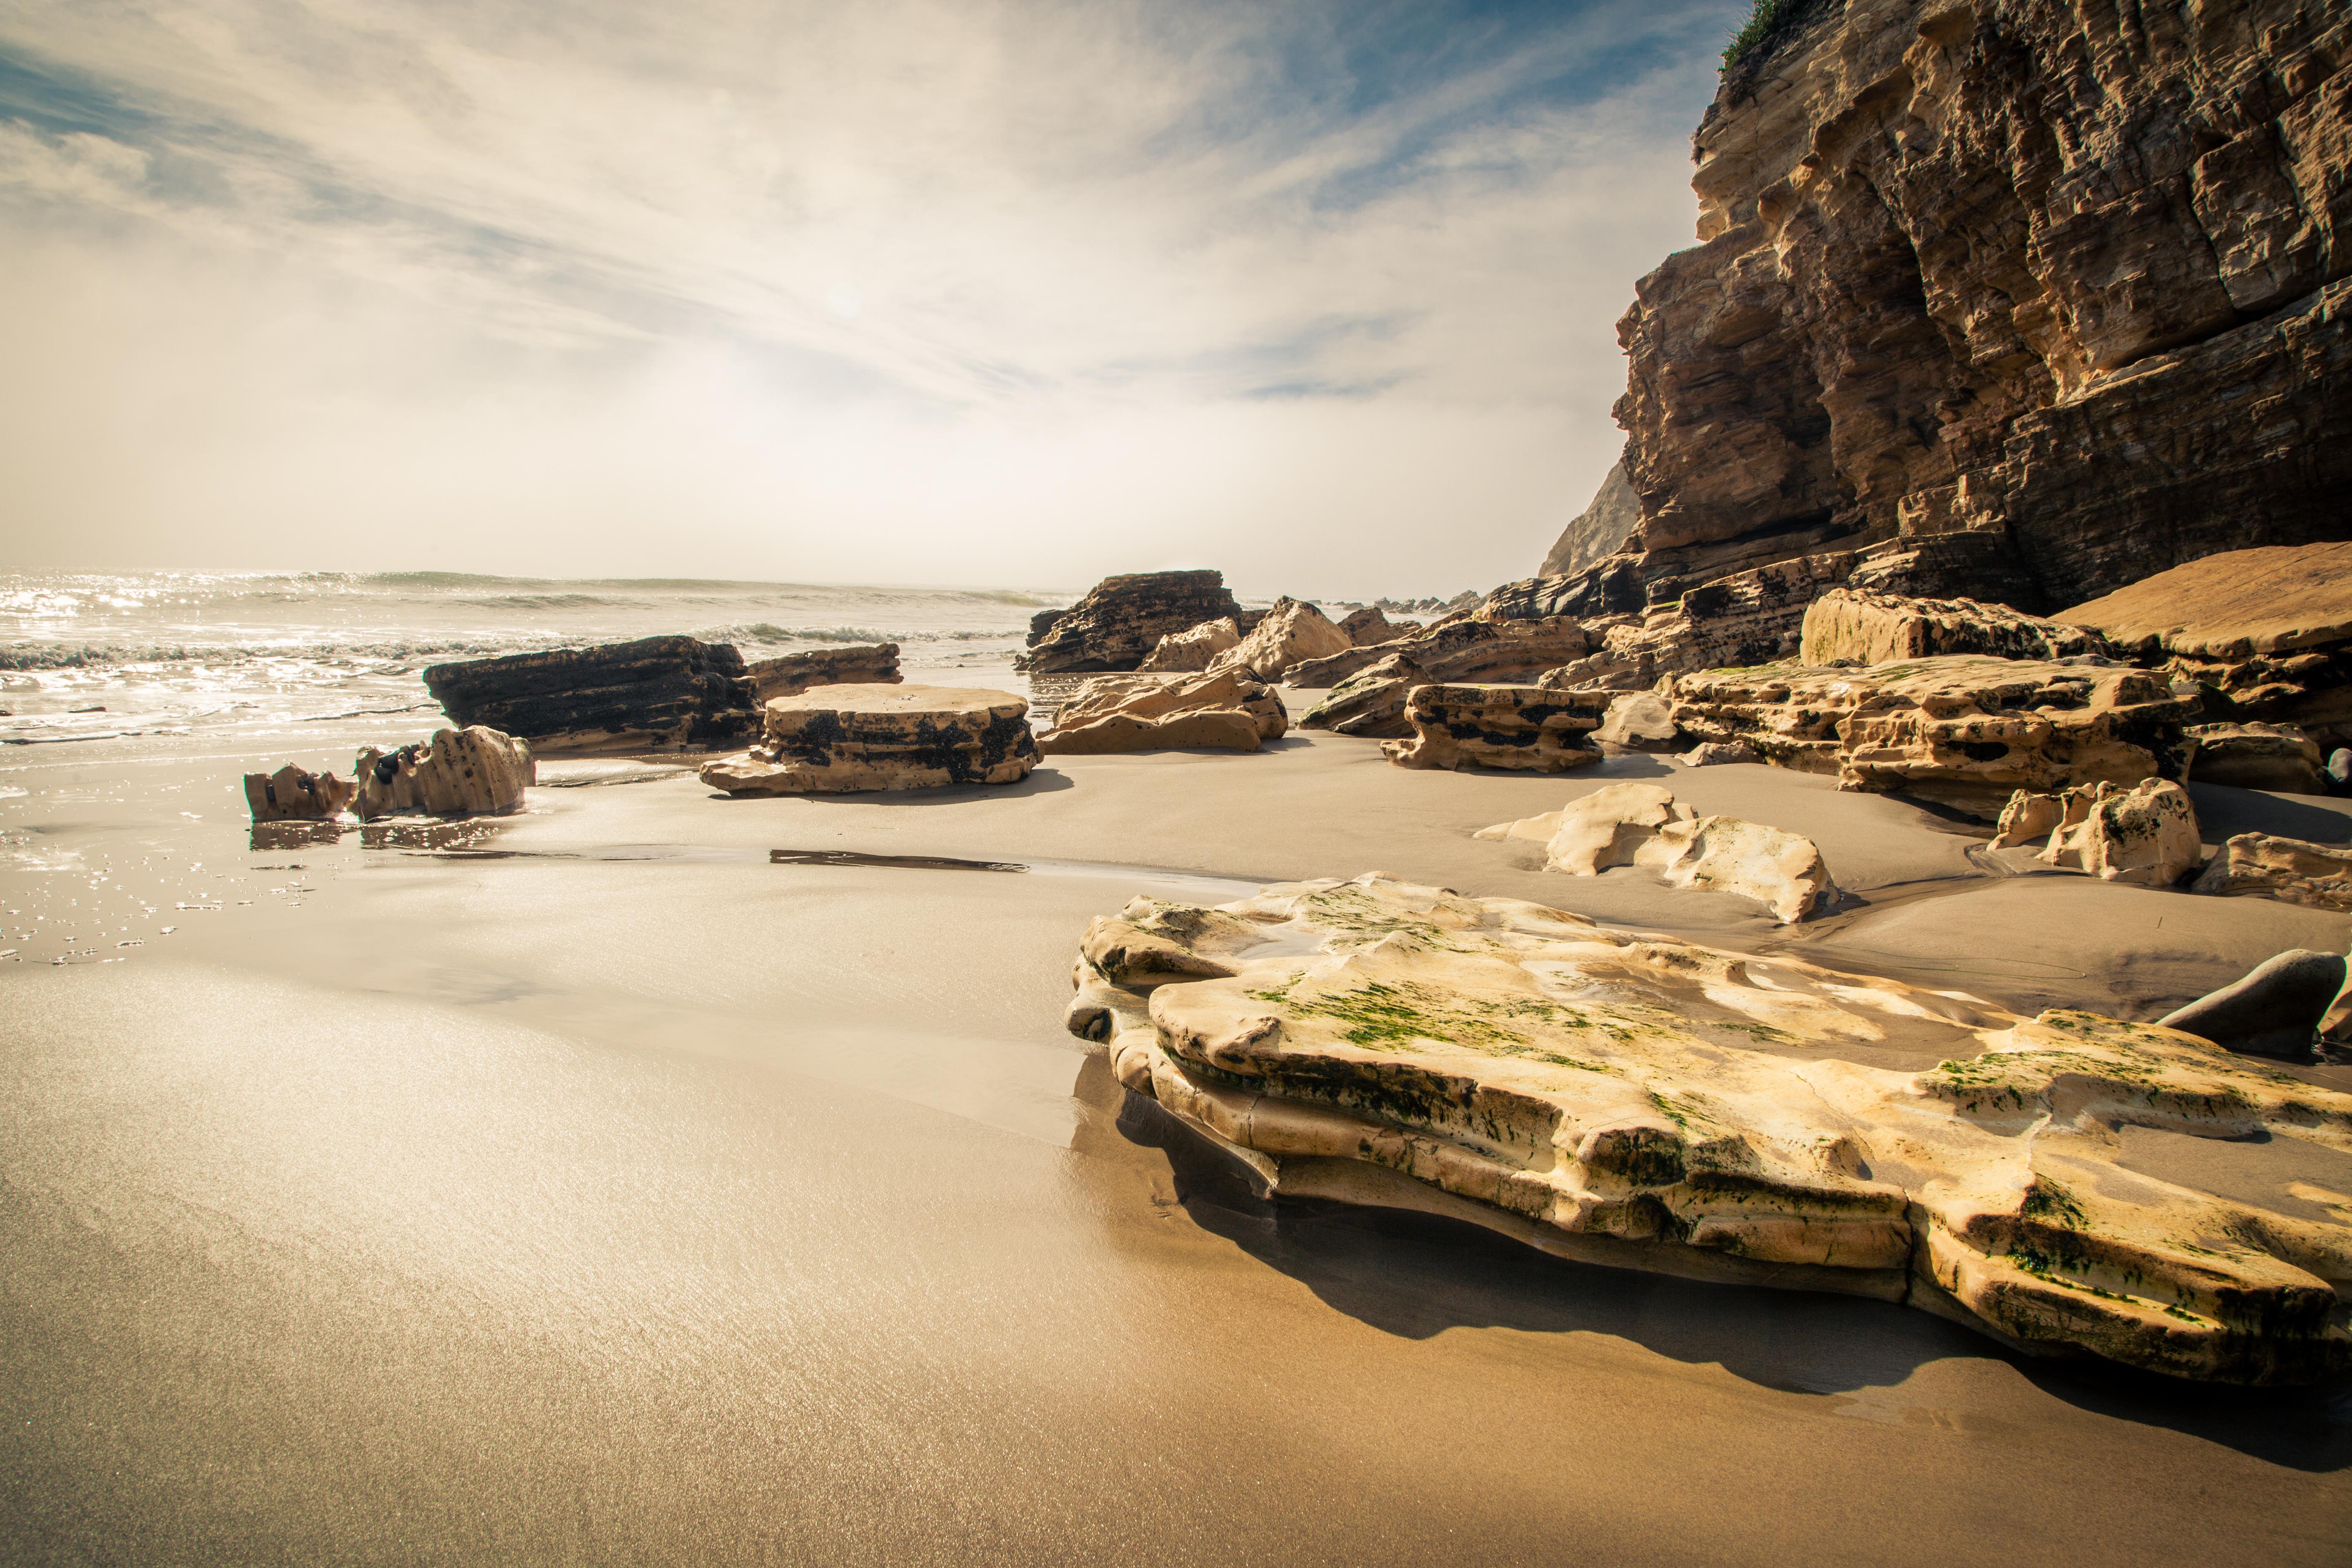 Refugio rocks